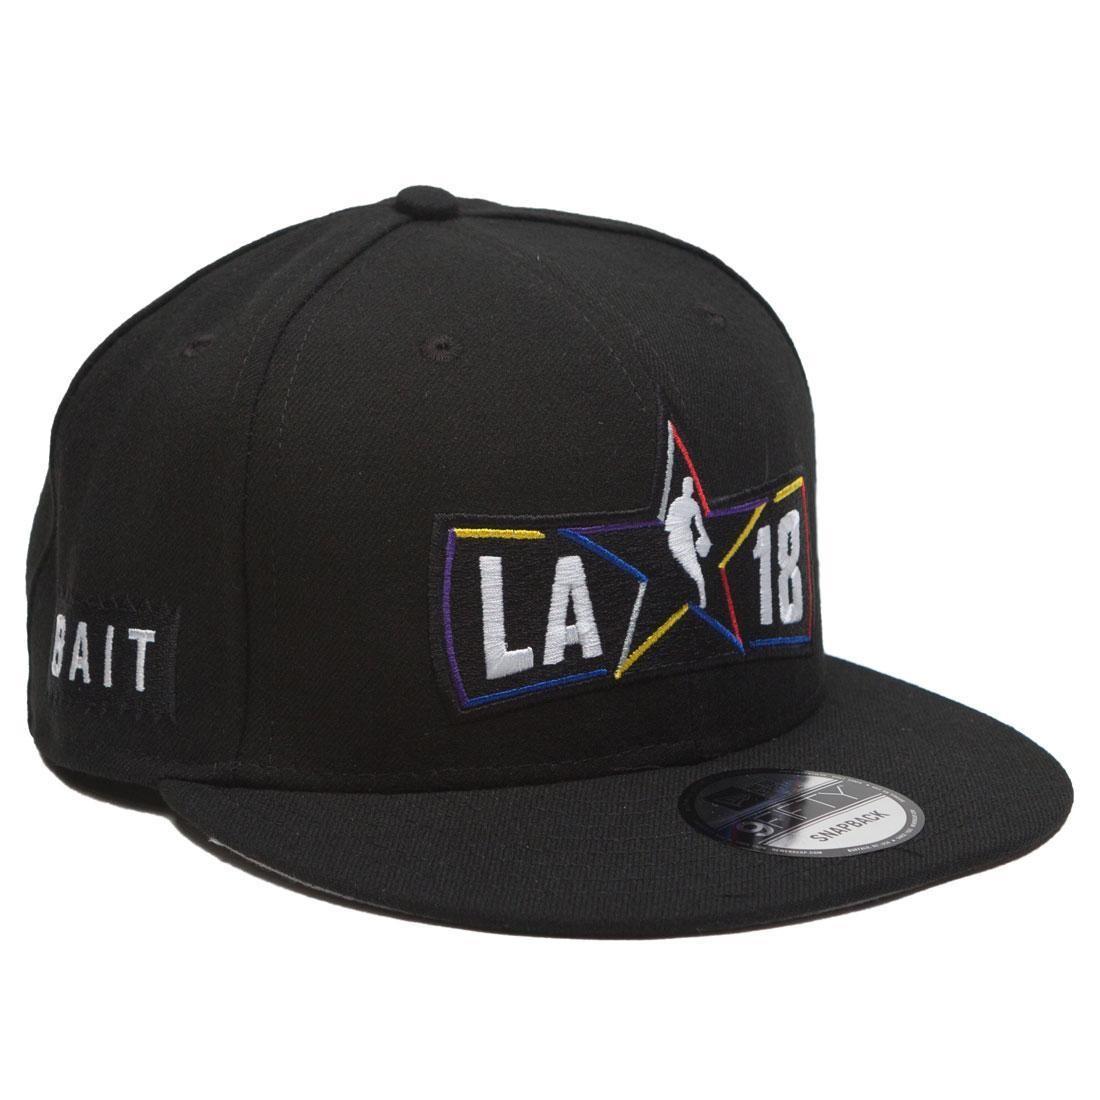 BAIT x NBA X New Era 9Fifty NBA All Star Game Alt Black Snapback Cap (black)